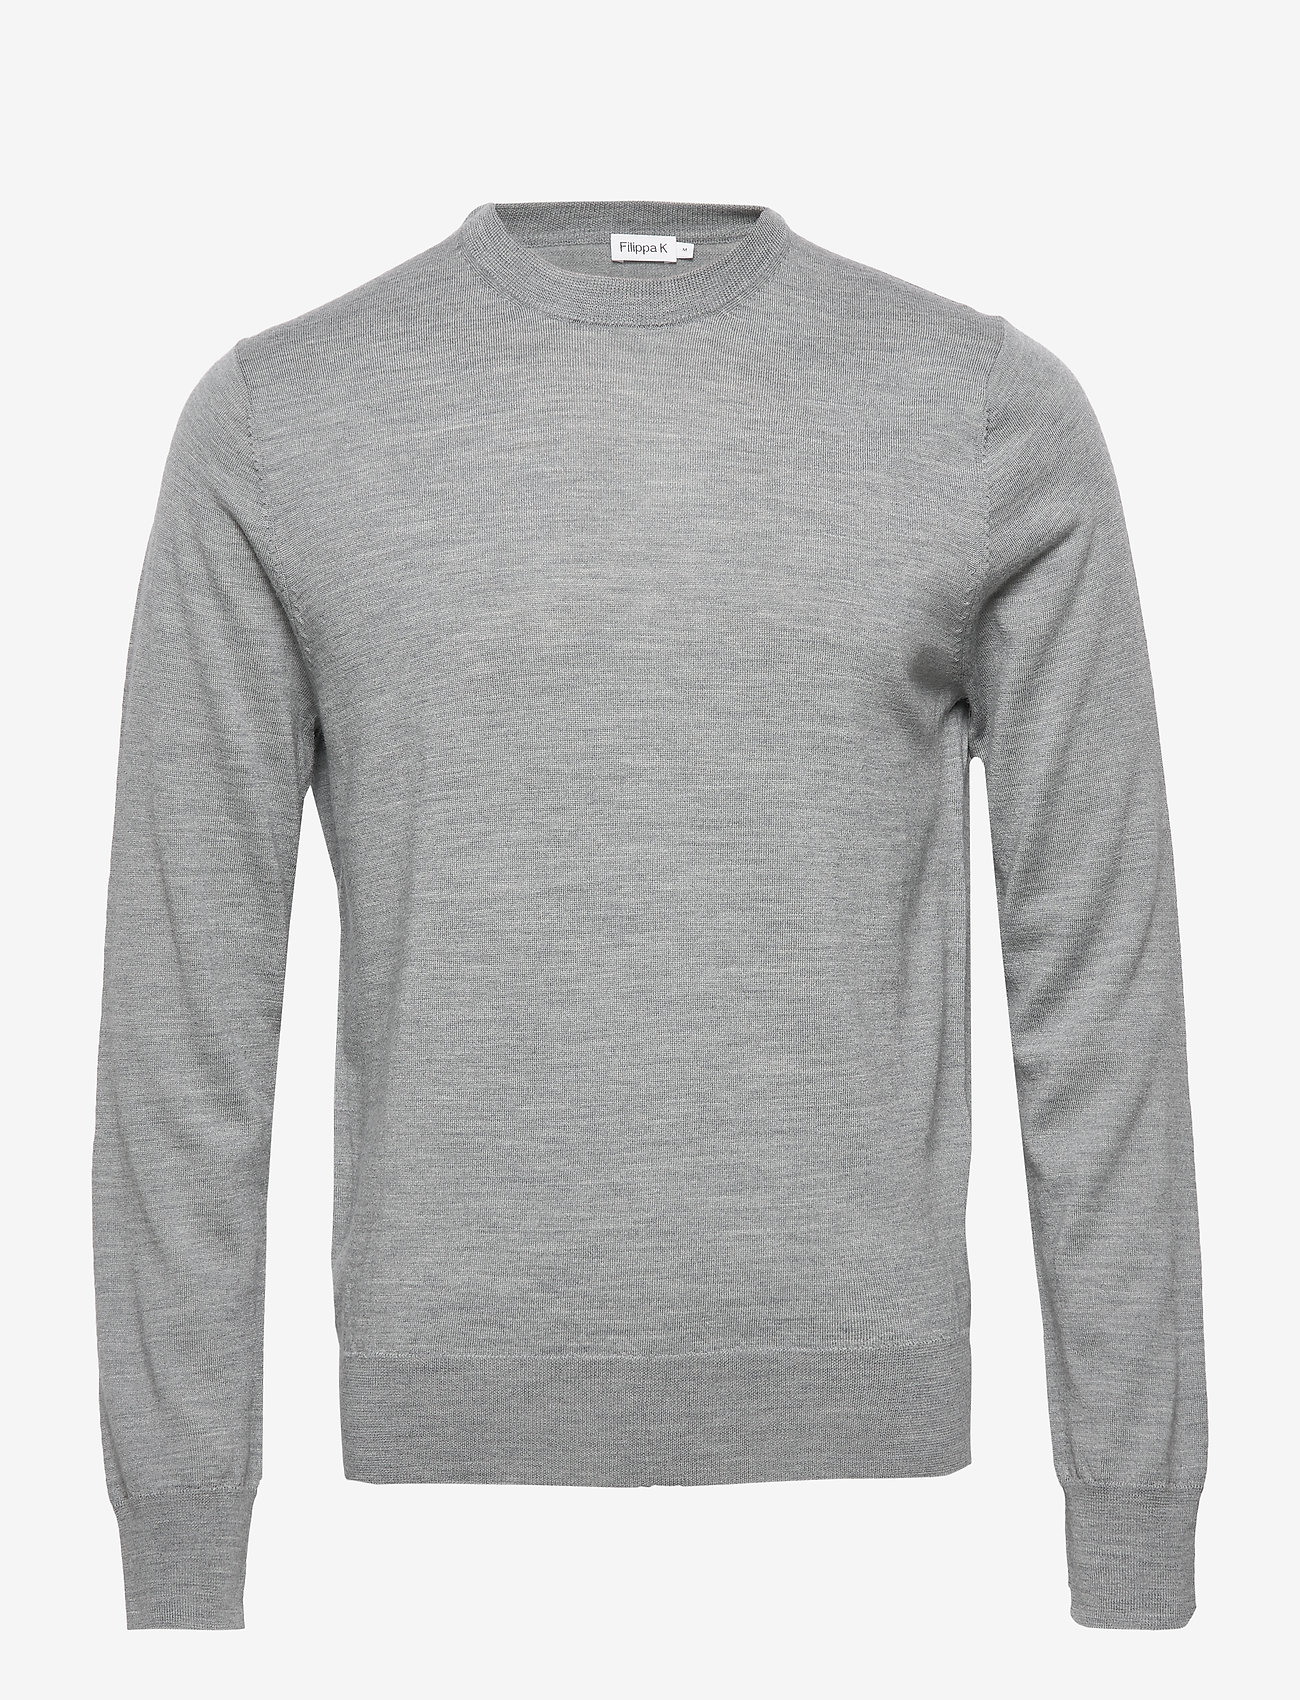 Filippa K - M. Merino Sweater - knitted round necks - grey mel. - 0